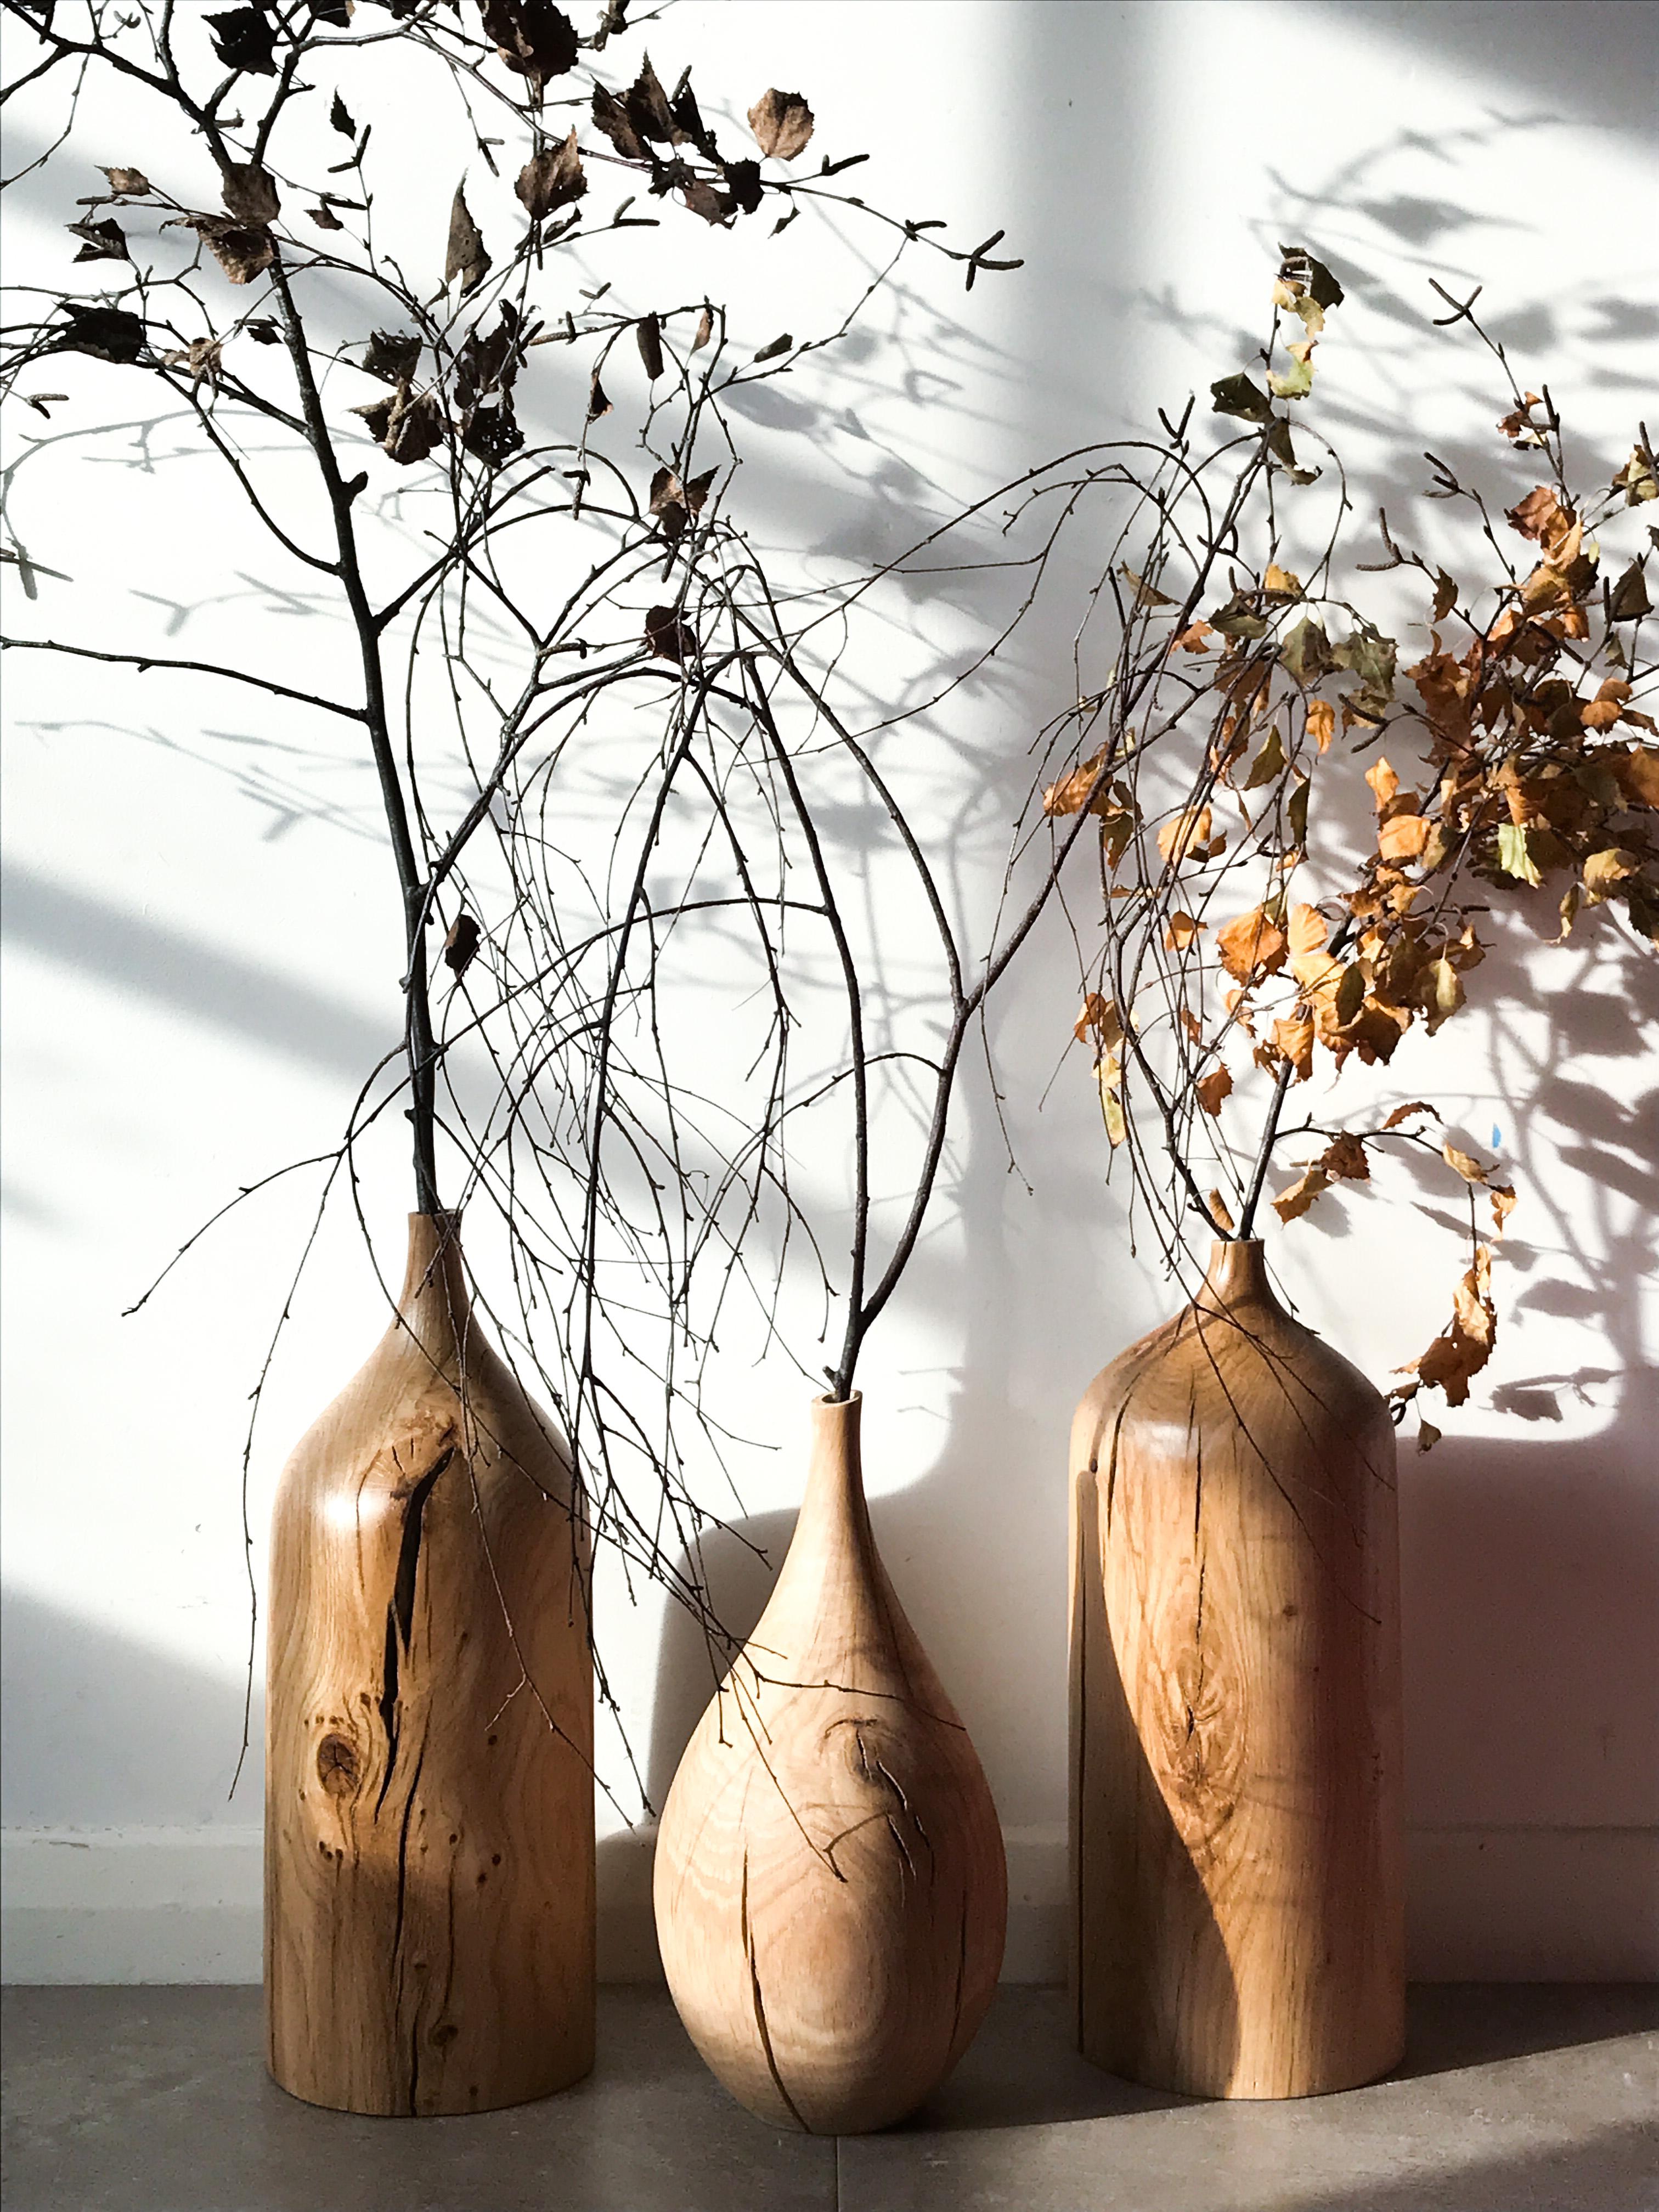 Carved oak vase by woodworker Jamie Gaunt